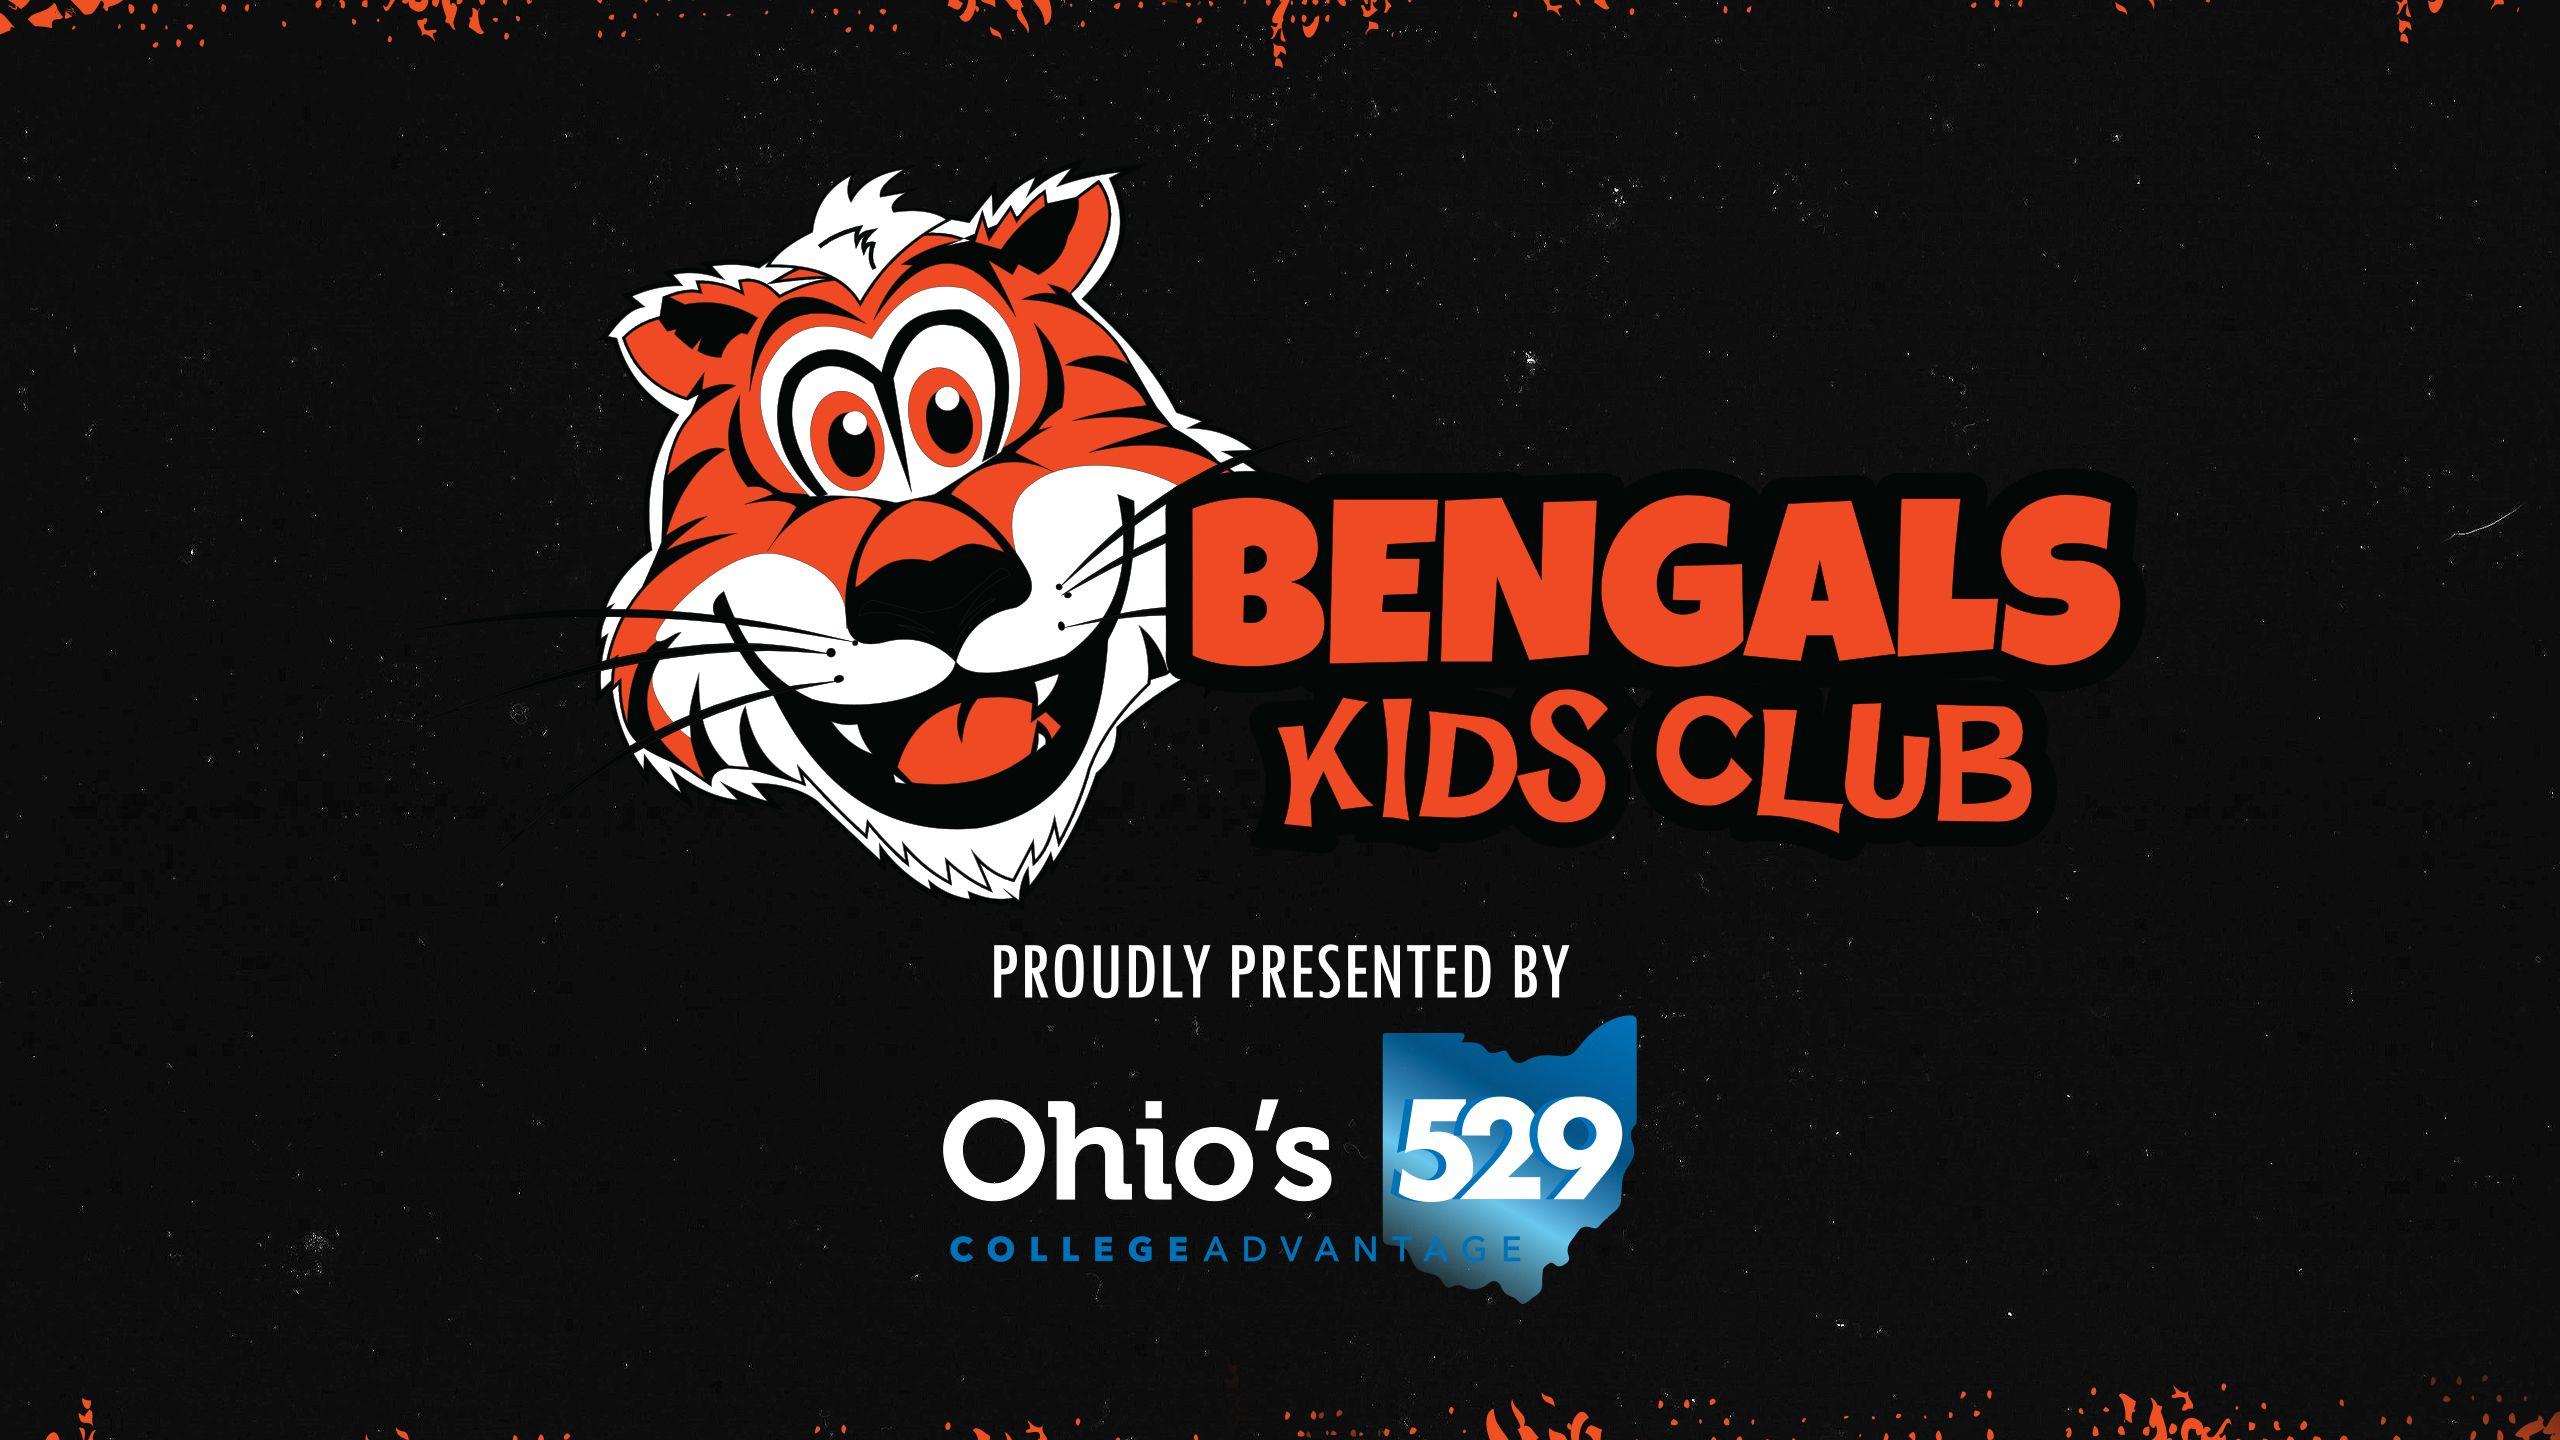 Bengals Kids Club